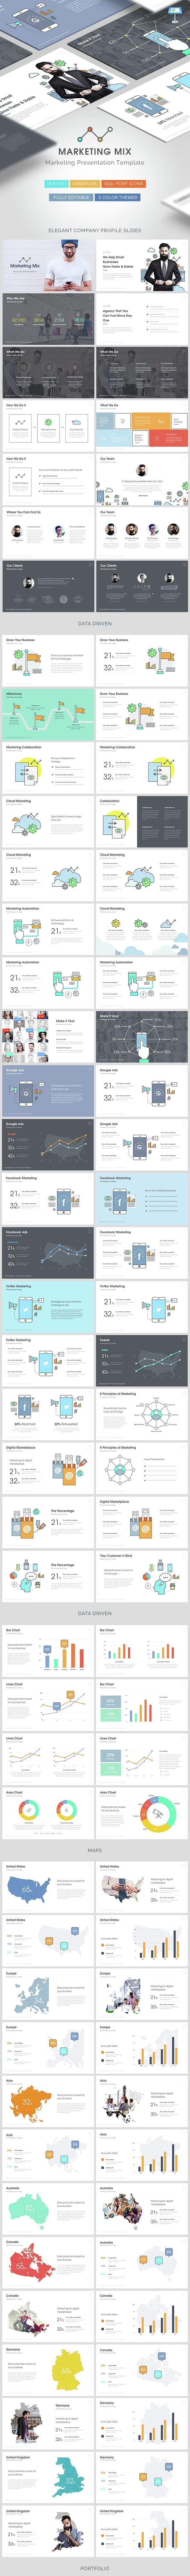 Social Media Mix - Creative Powerpoint Template - PowerPoint Templates Presentation Templates